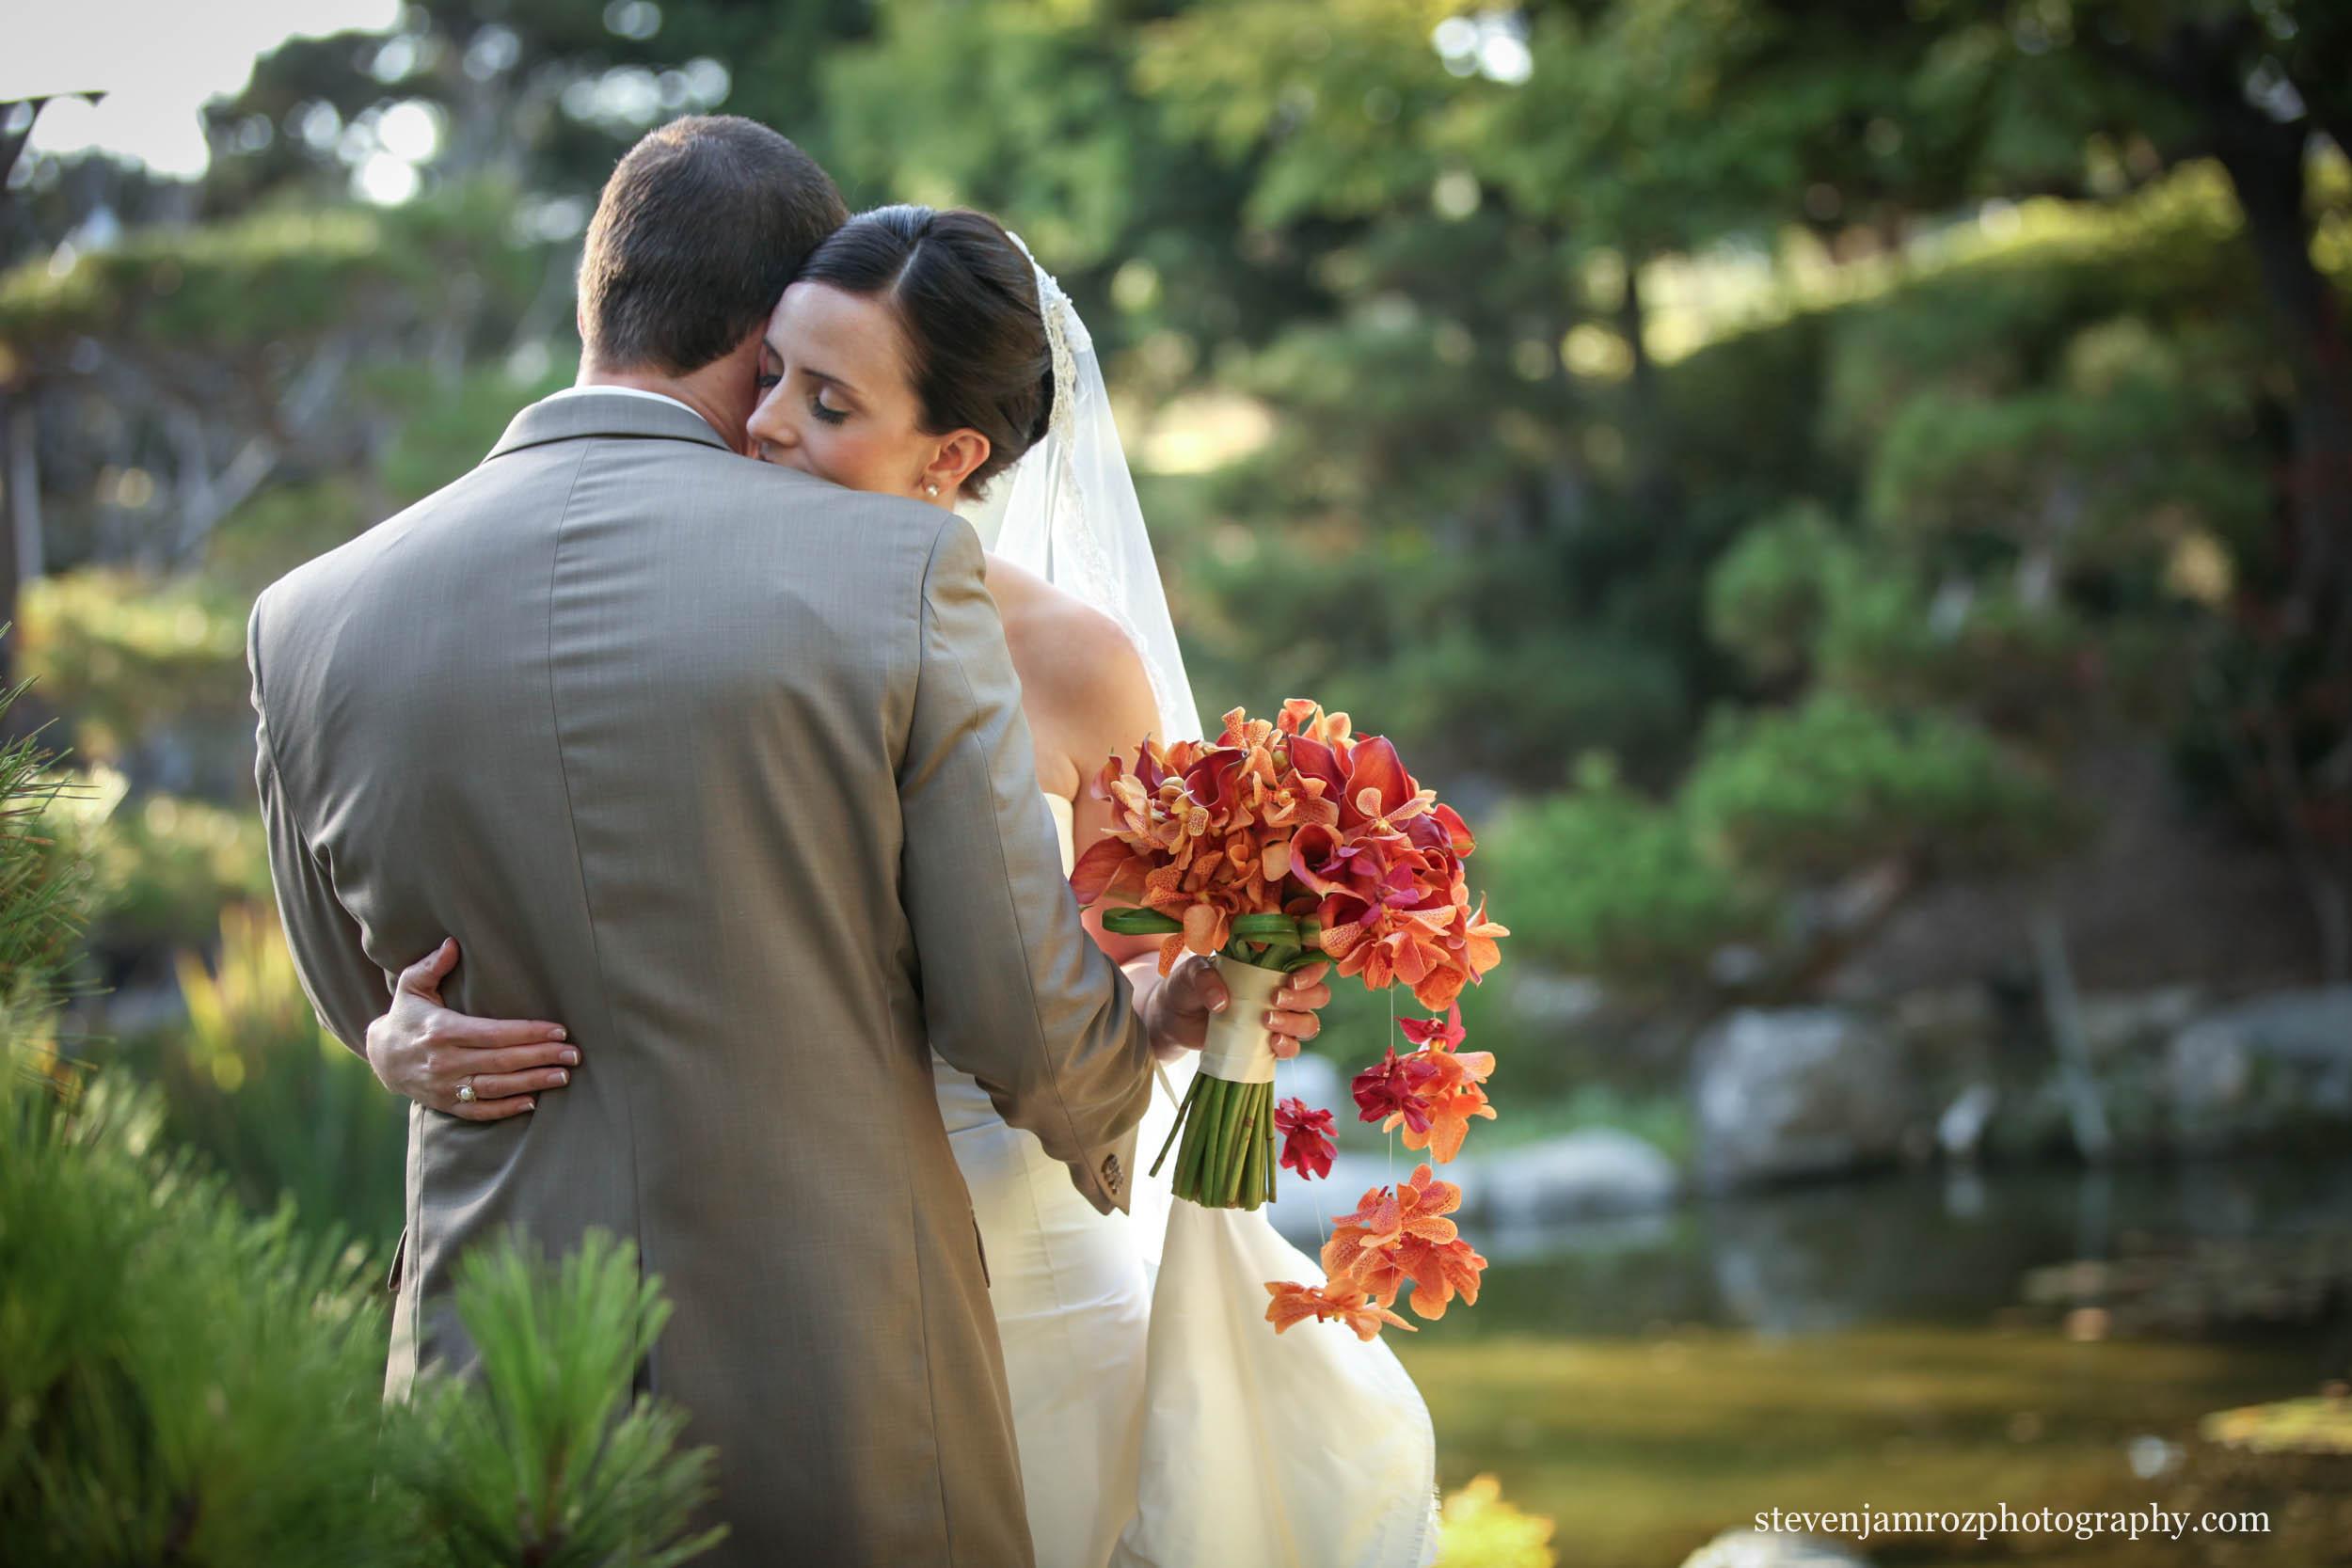 bride-groom-flower-bouquet-wedding-raleigh-steven-jamroz-photography-0561.jpg